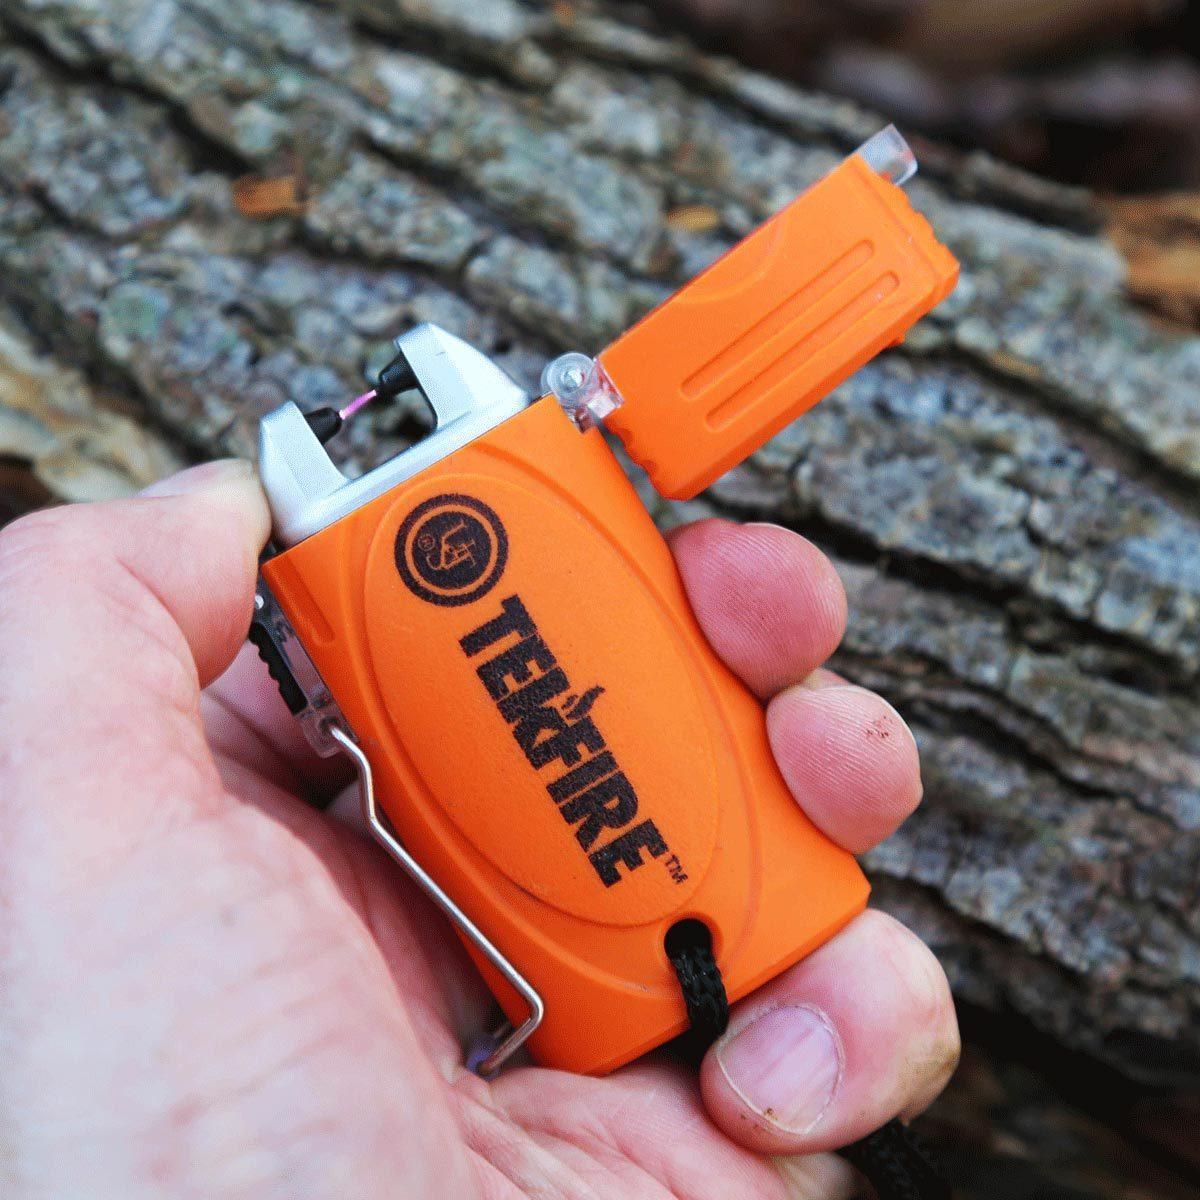 UST Brands TekFire Fuel-Free Lighter